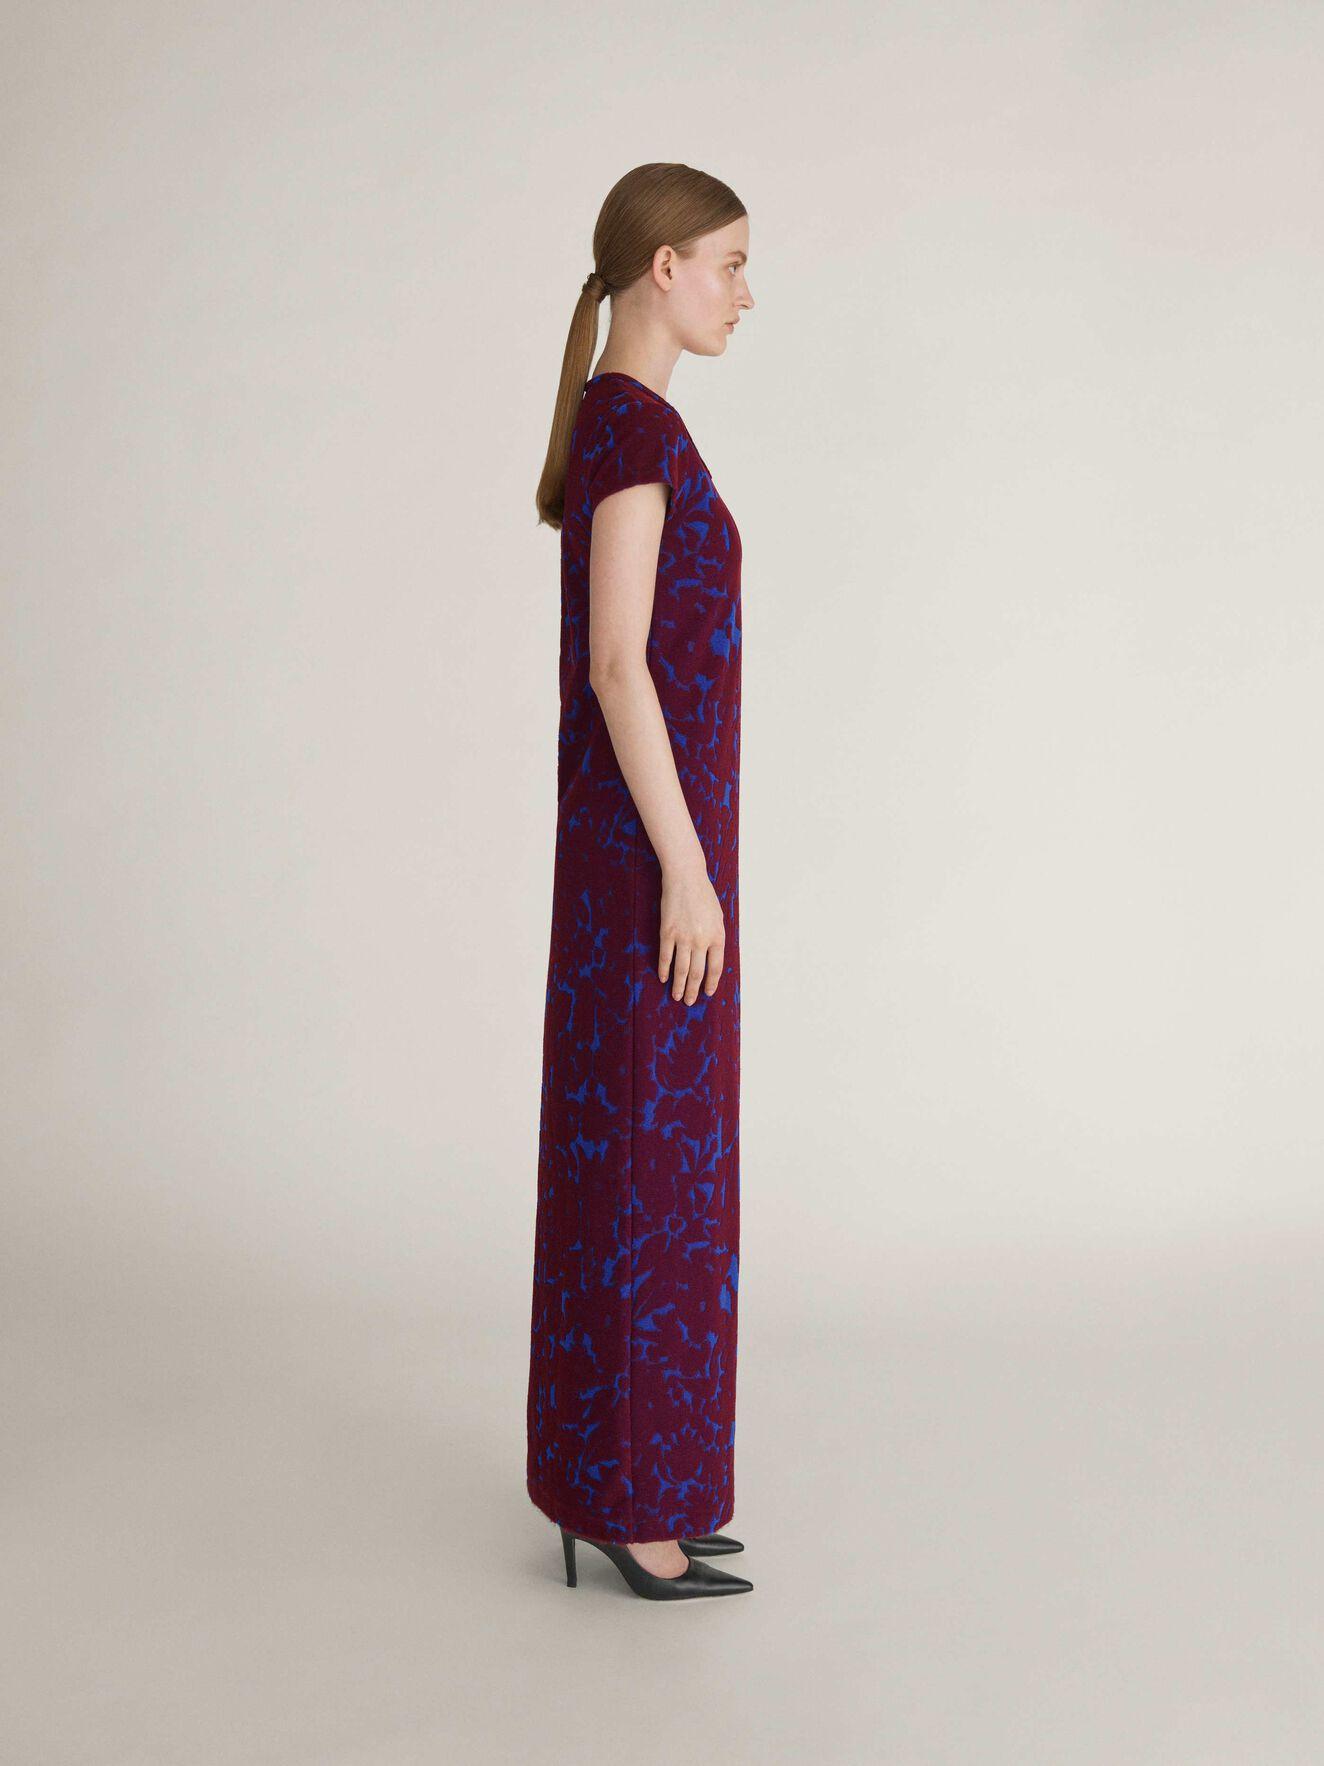 Jacci Dress in ARTWORK from Tiger of Sweden